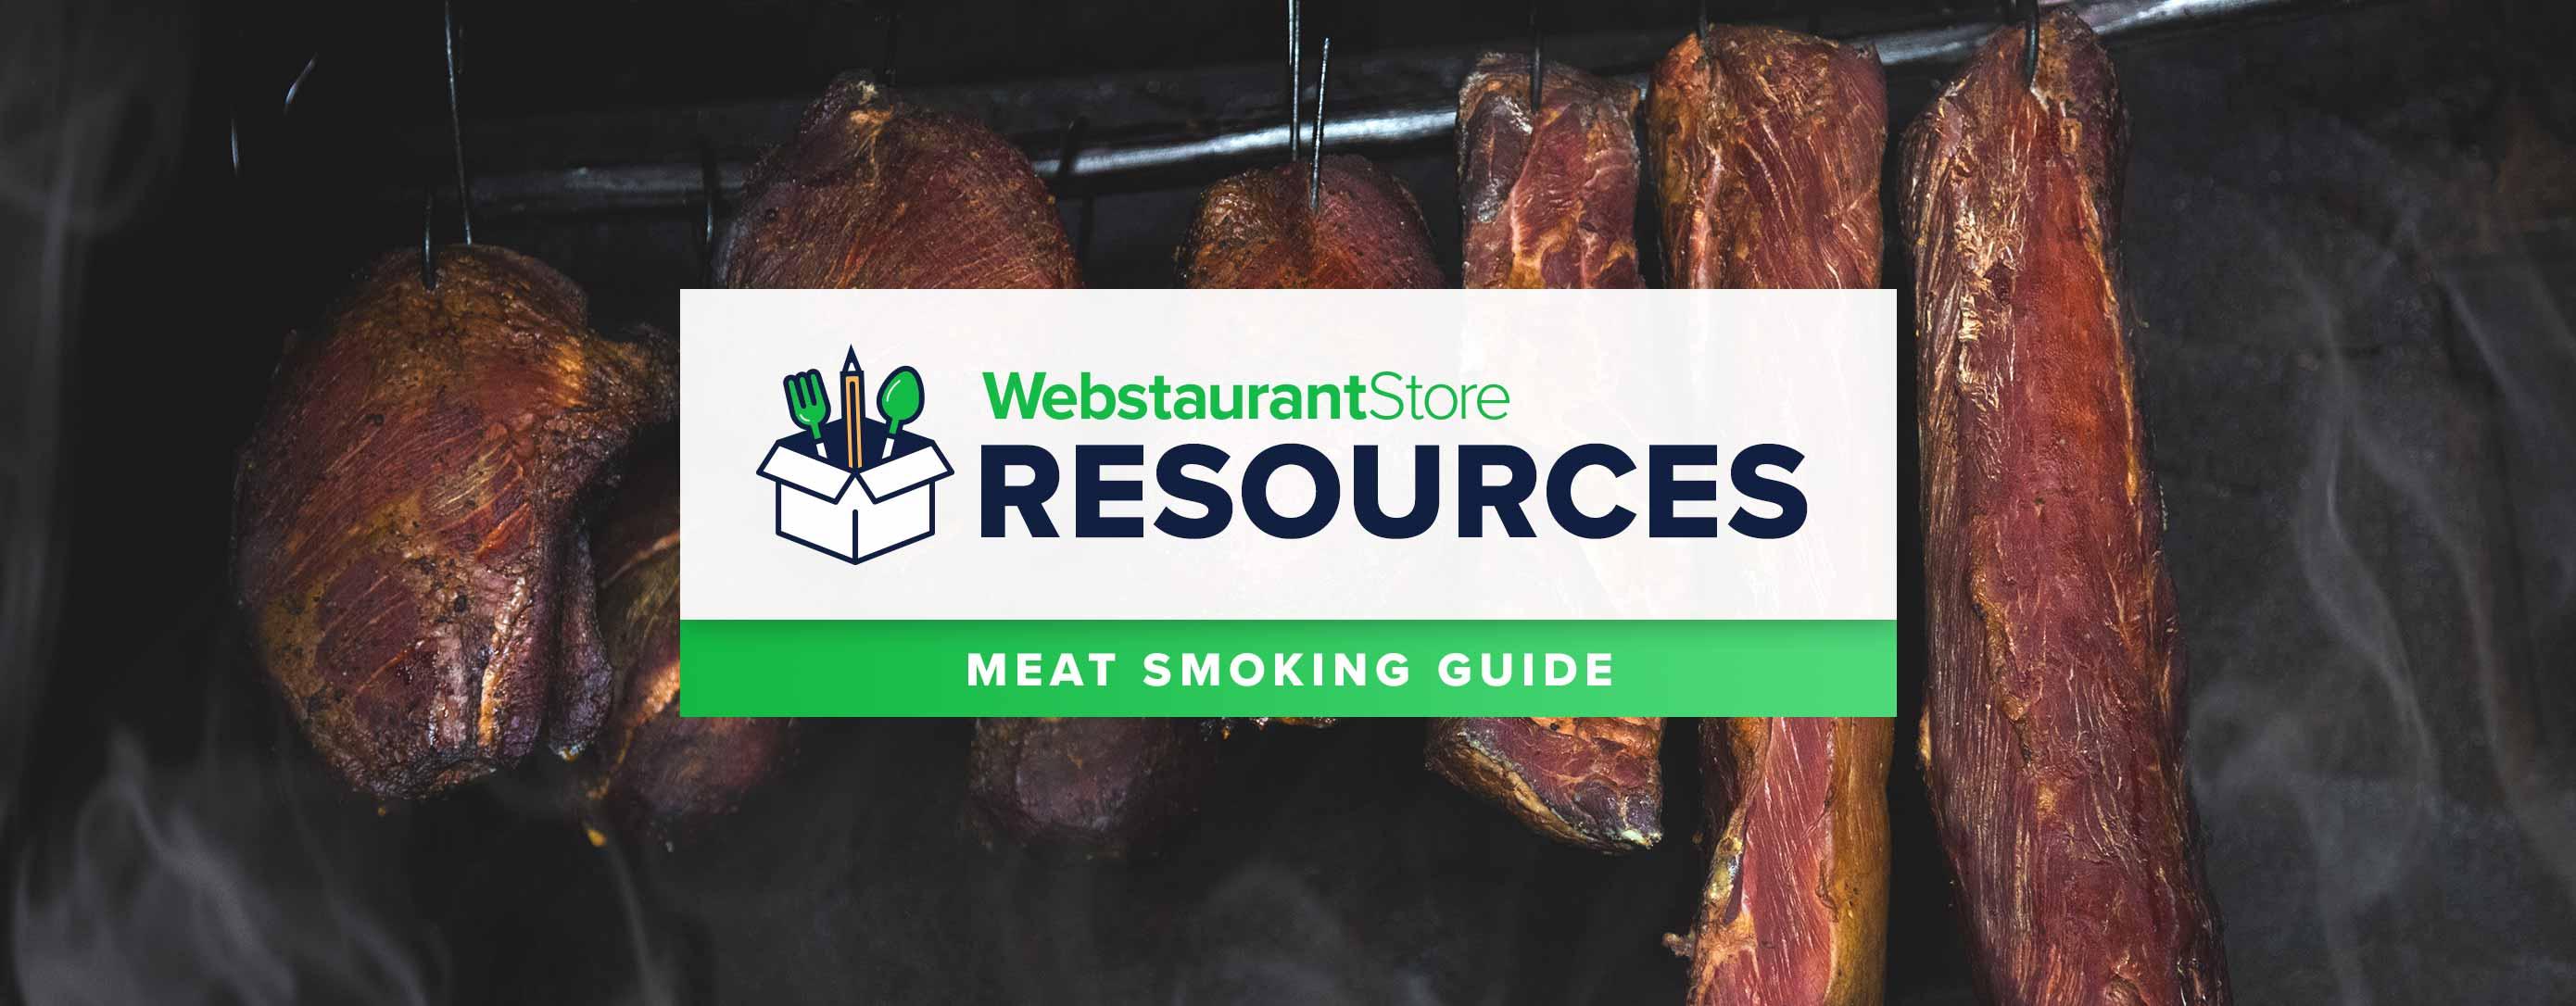 Meat Smoking Guide